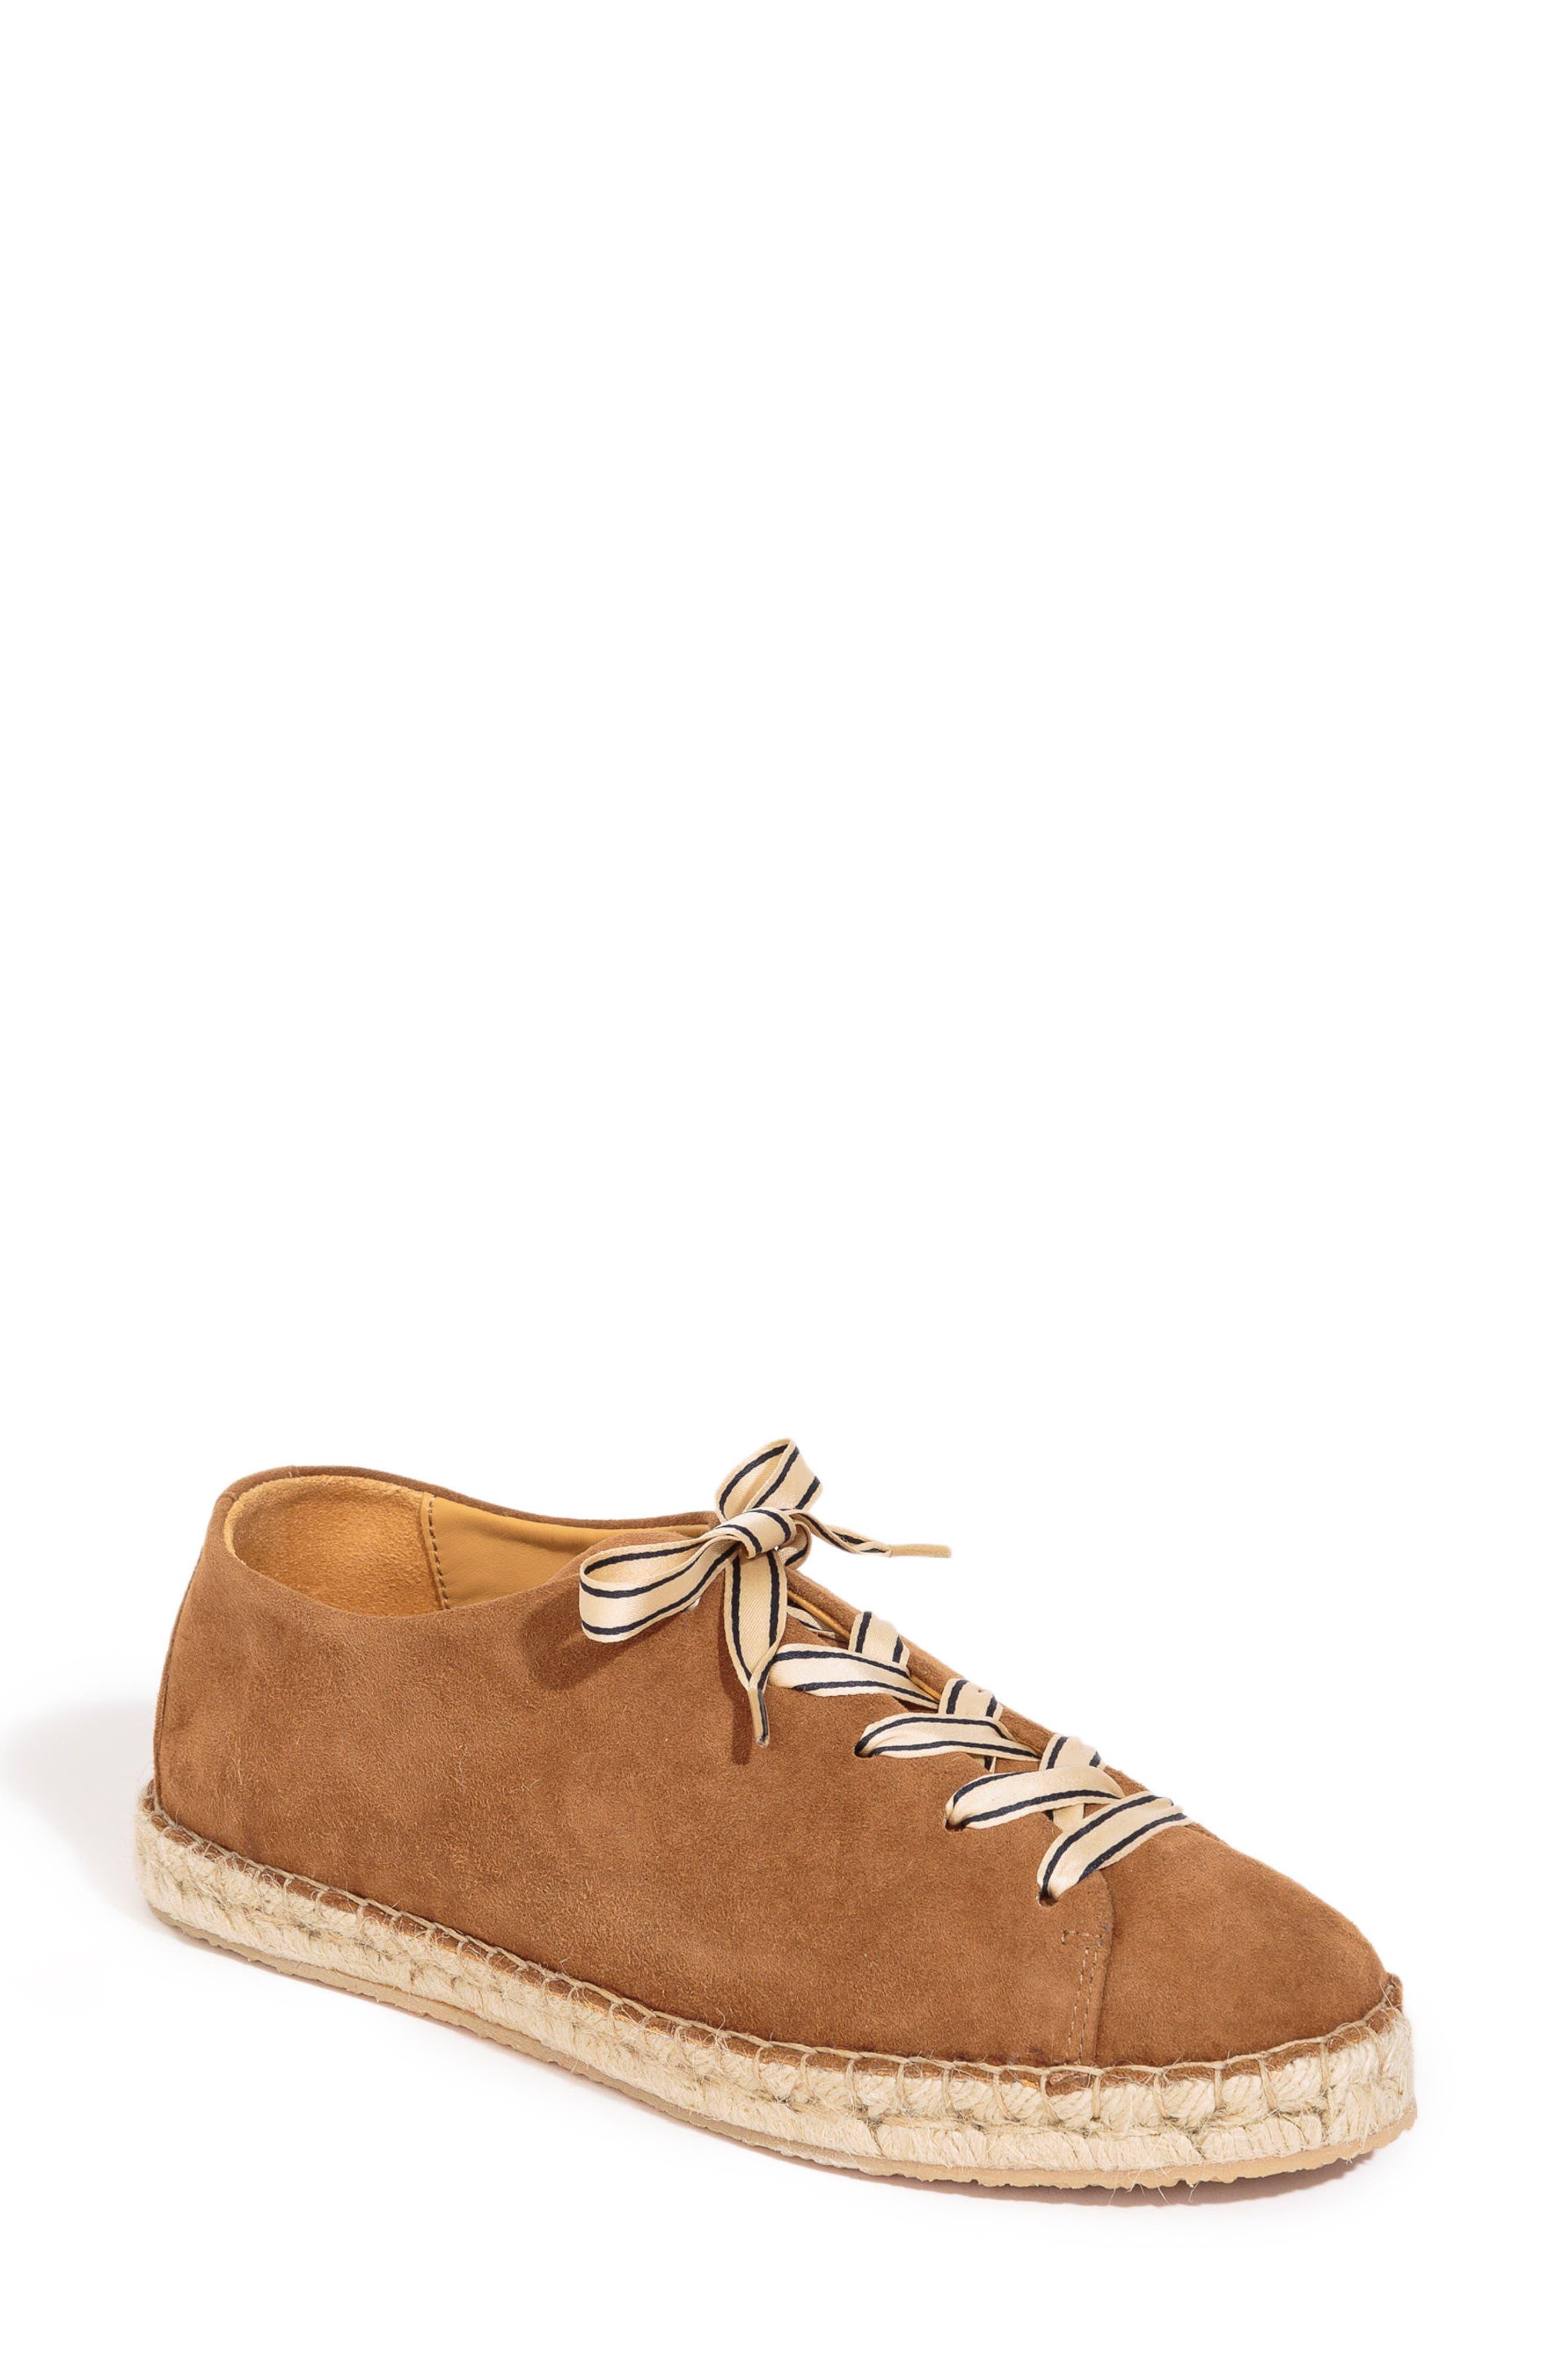 Julie Espadrille Sneaker,                         Main,                         color, Hazelnut Brown Suede